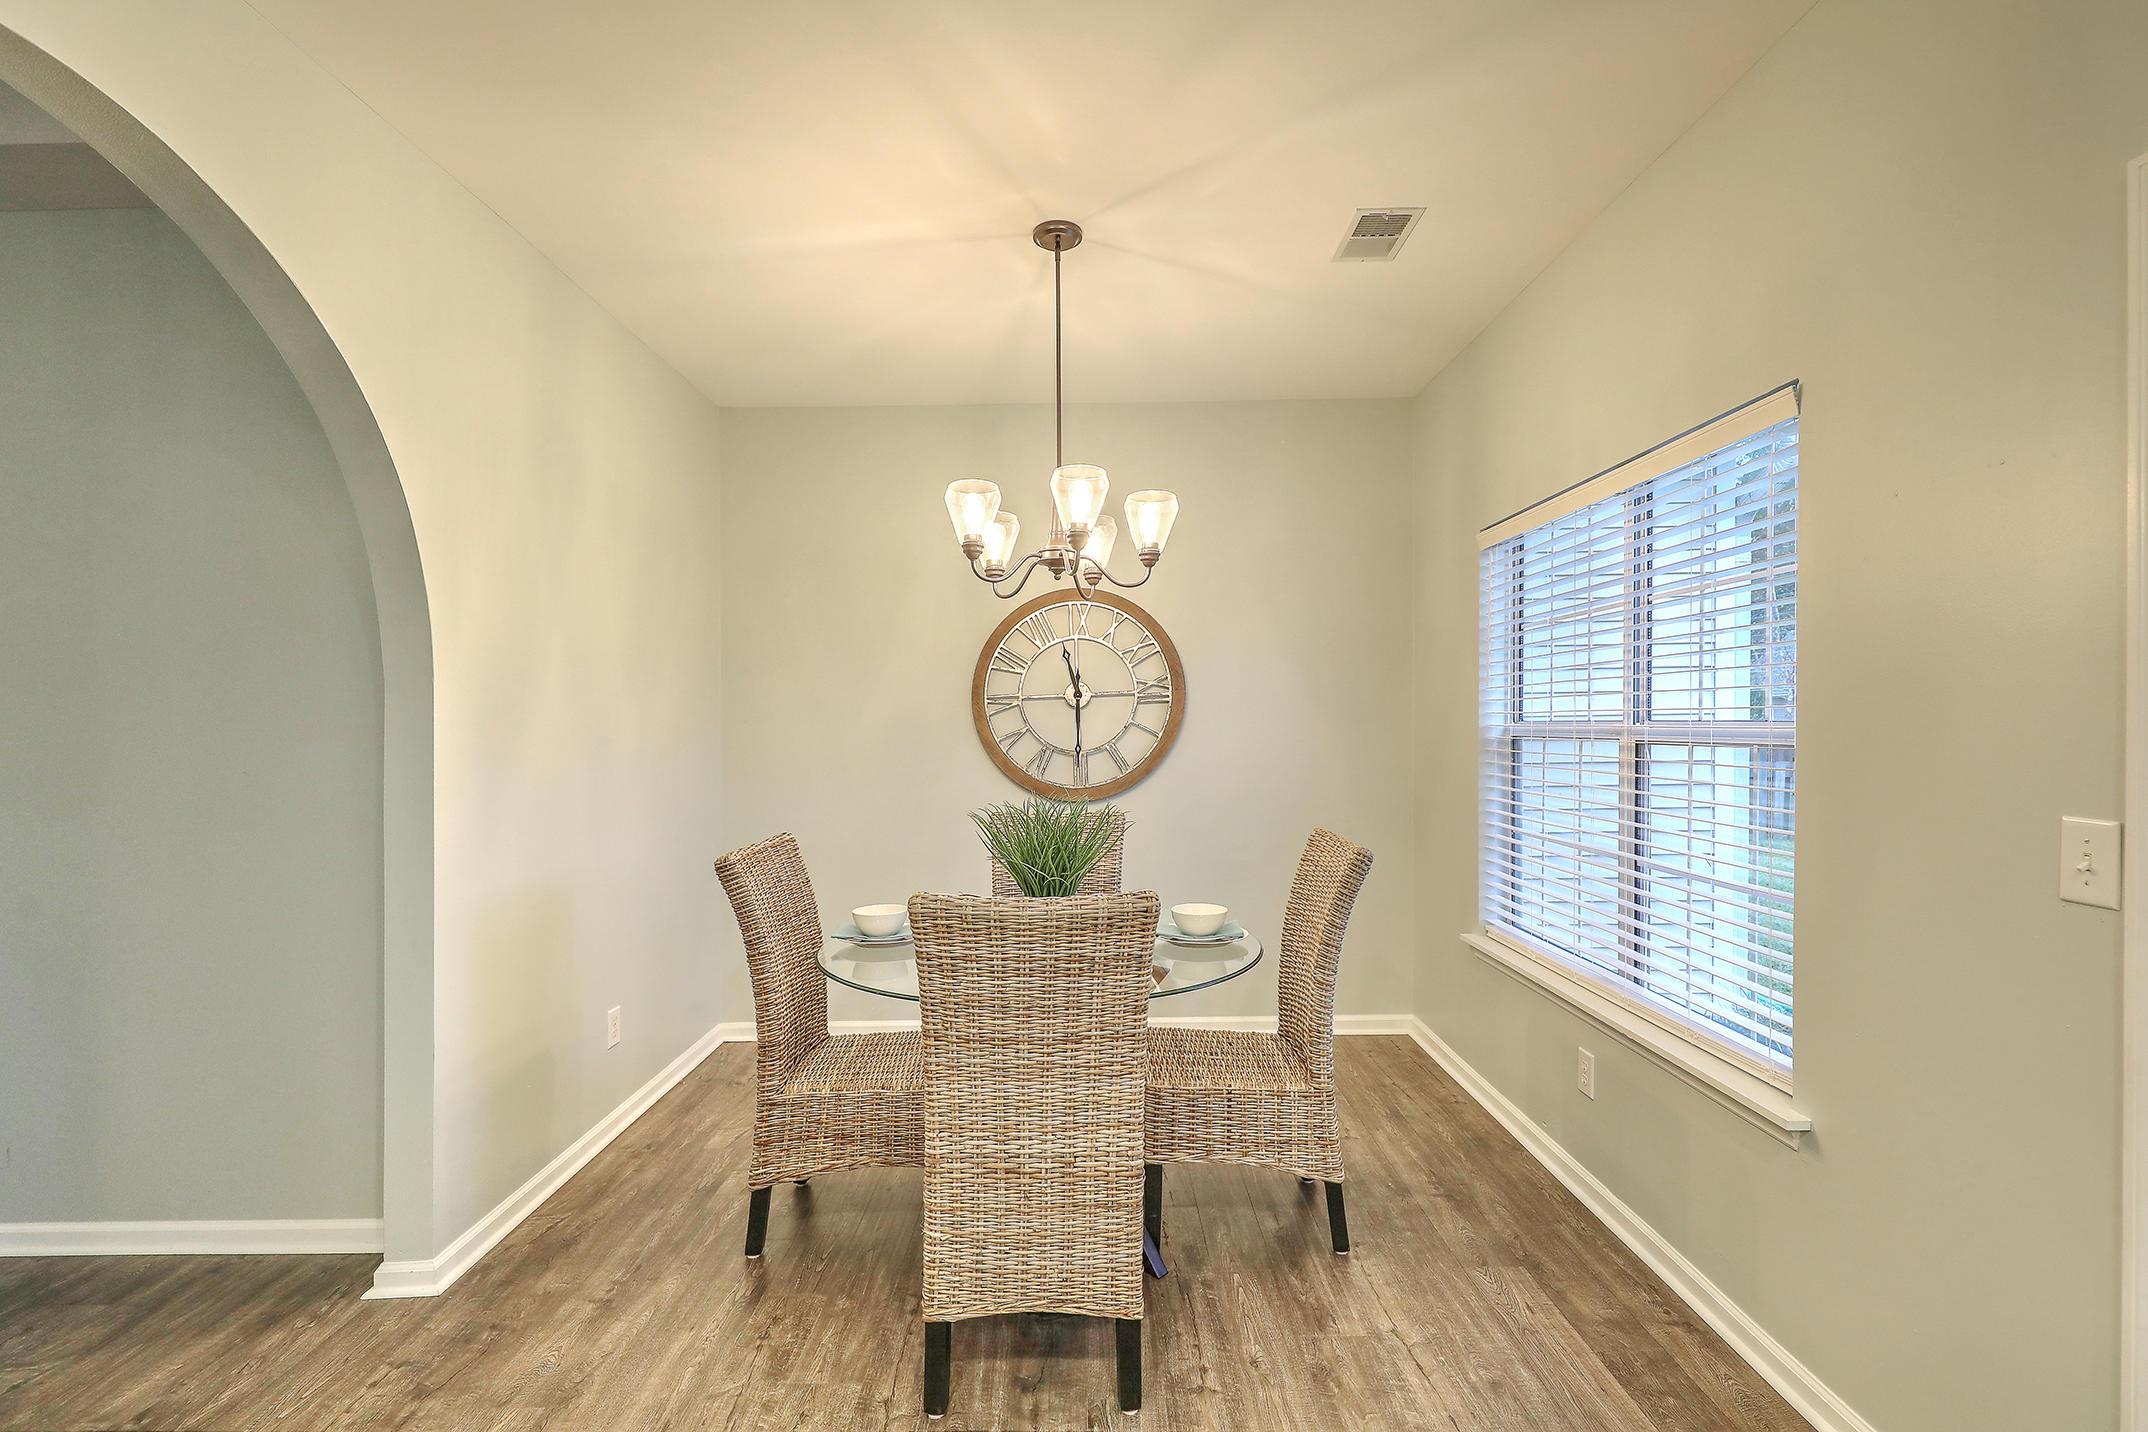 Dunes West Homes For Sale - 1309 Sassafrass, Mount Pleasant, SC - 27